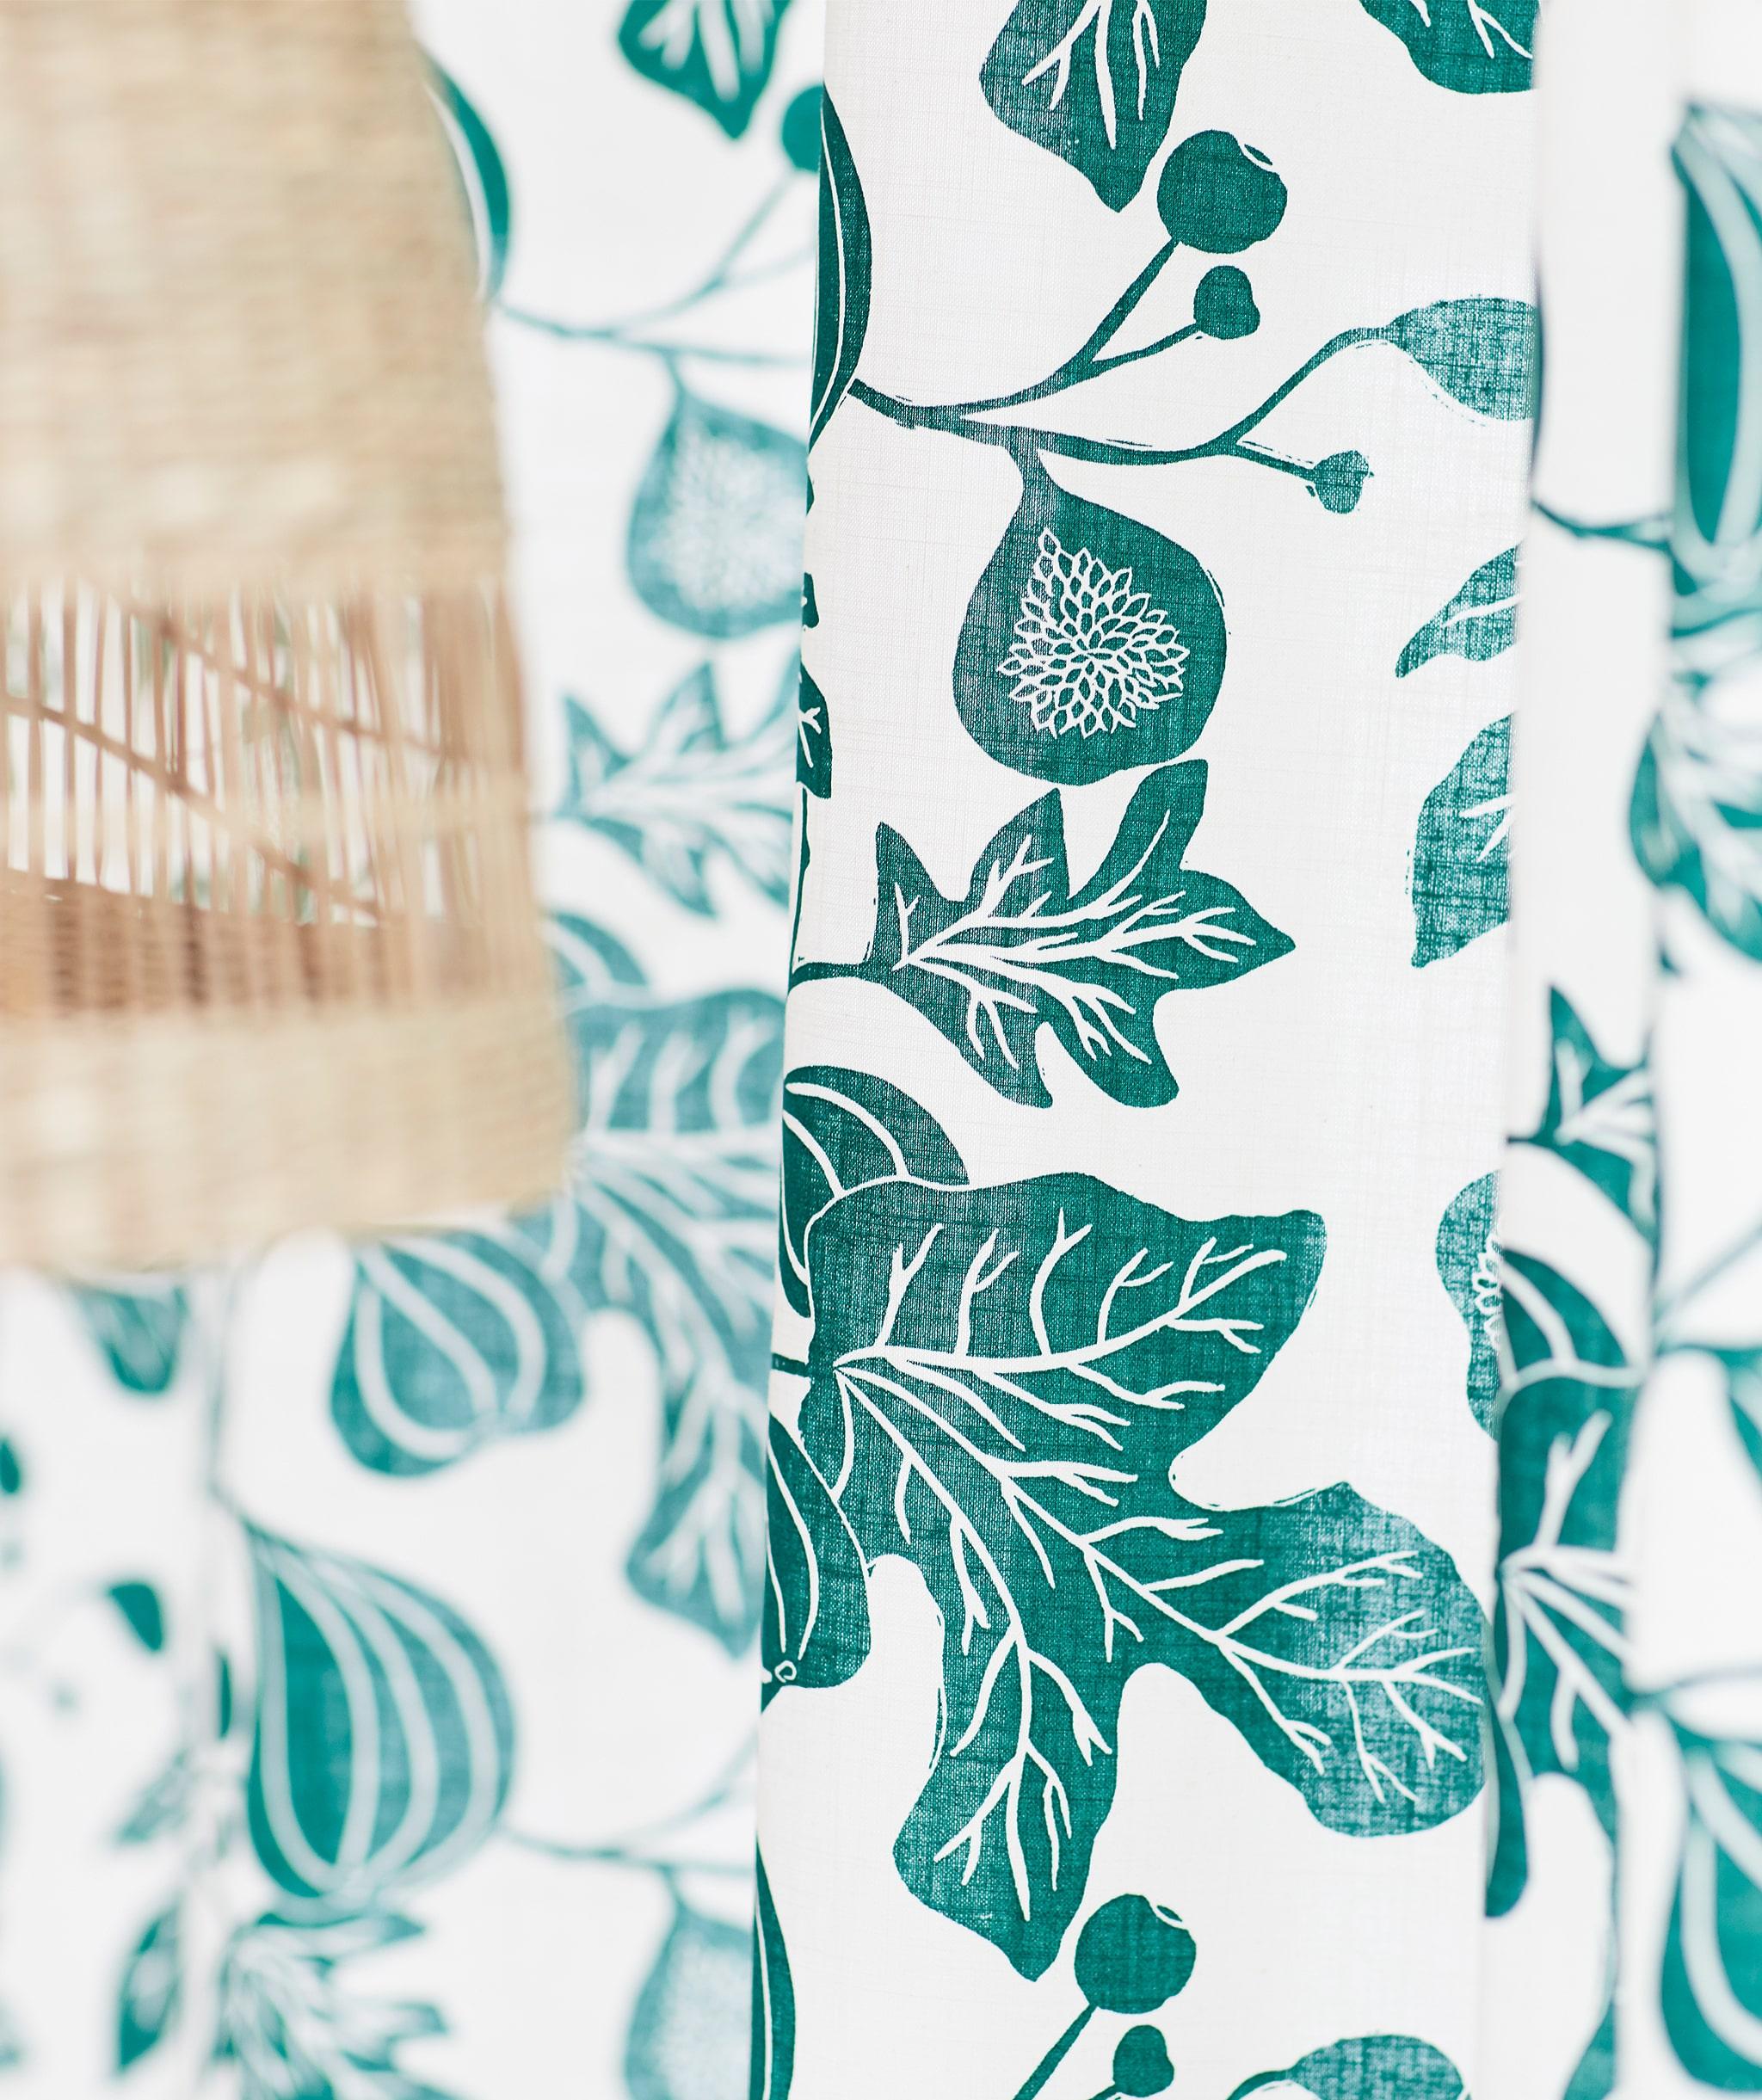 Tirai putih dengan pola ranting pohon ara warna hijau, berada di sebelah lampu plafon yang terbuat dari serat pisang alami.